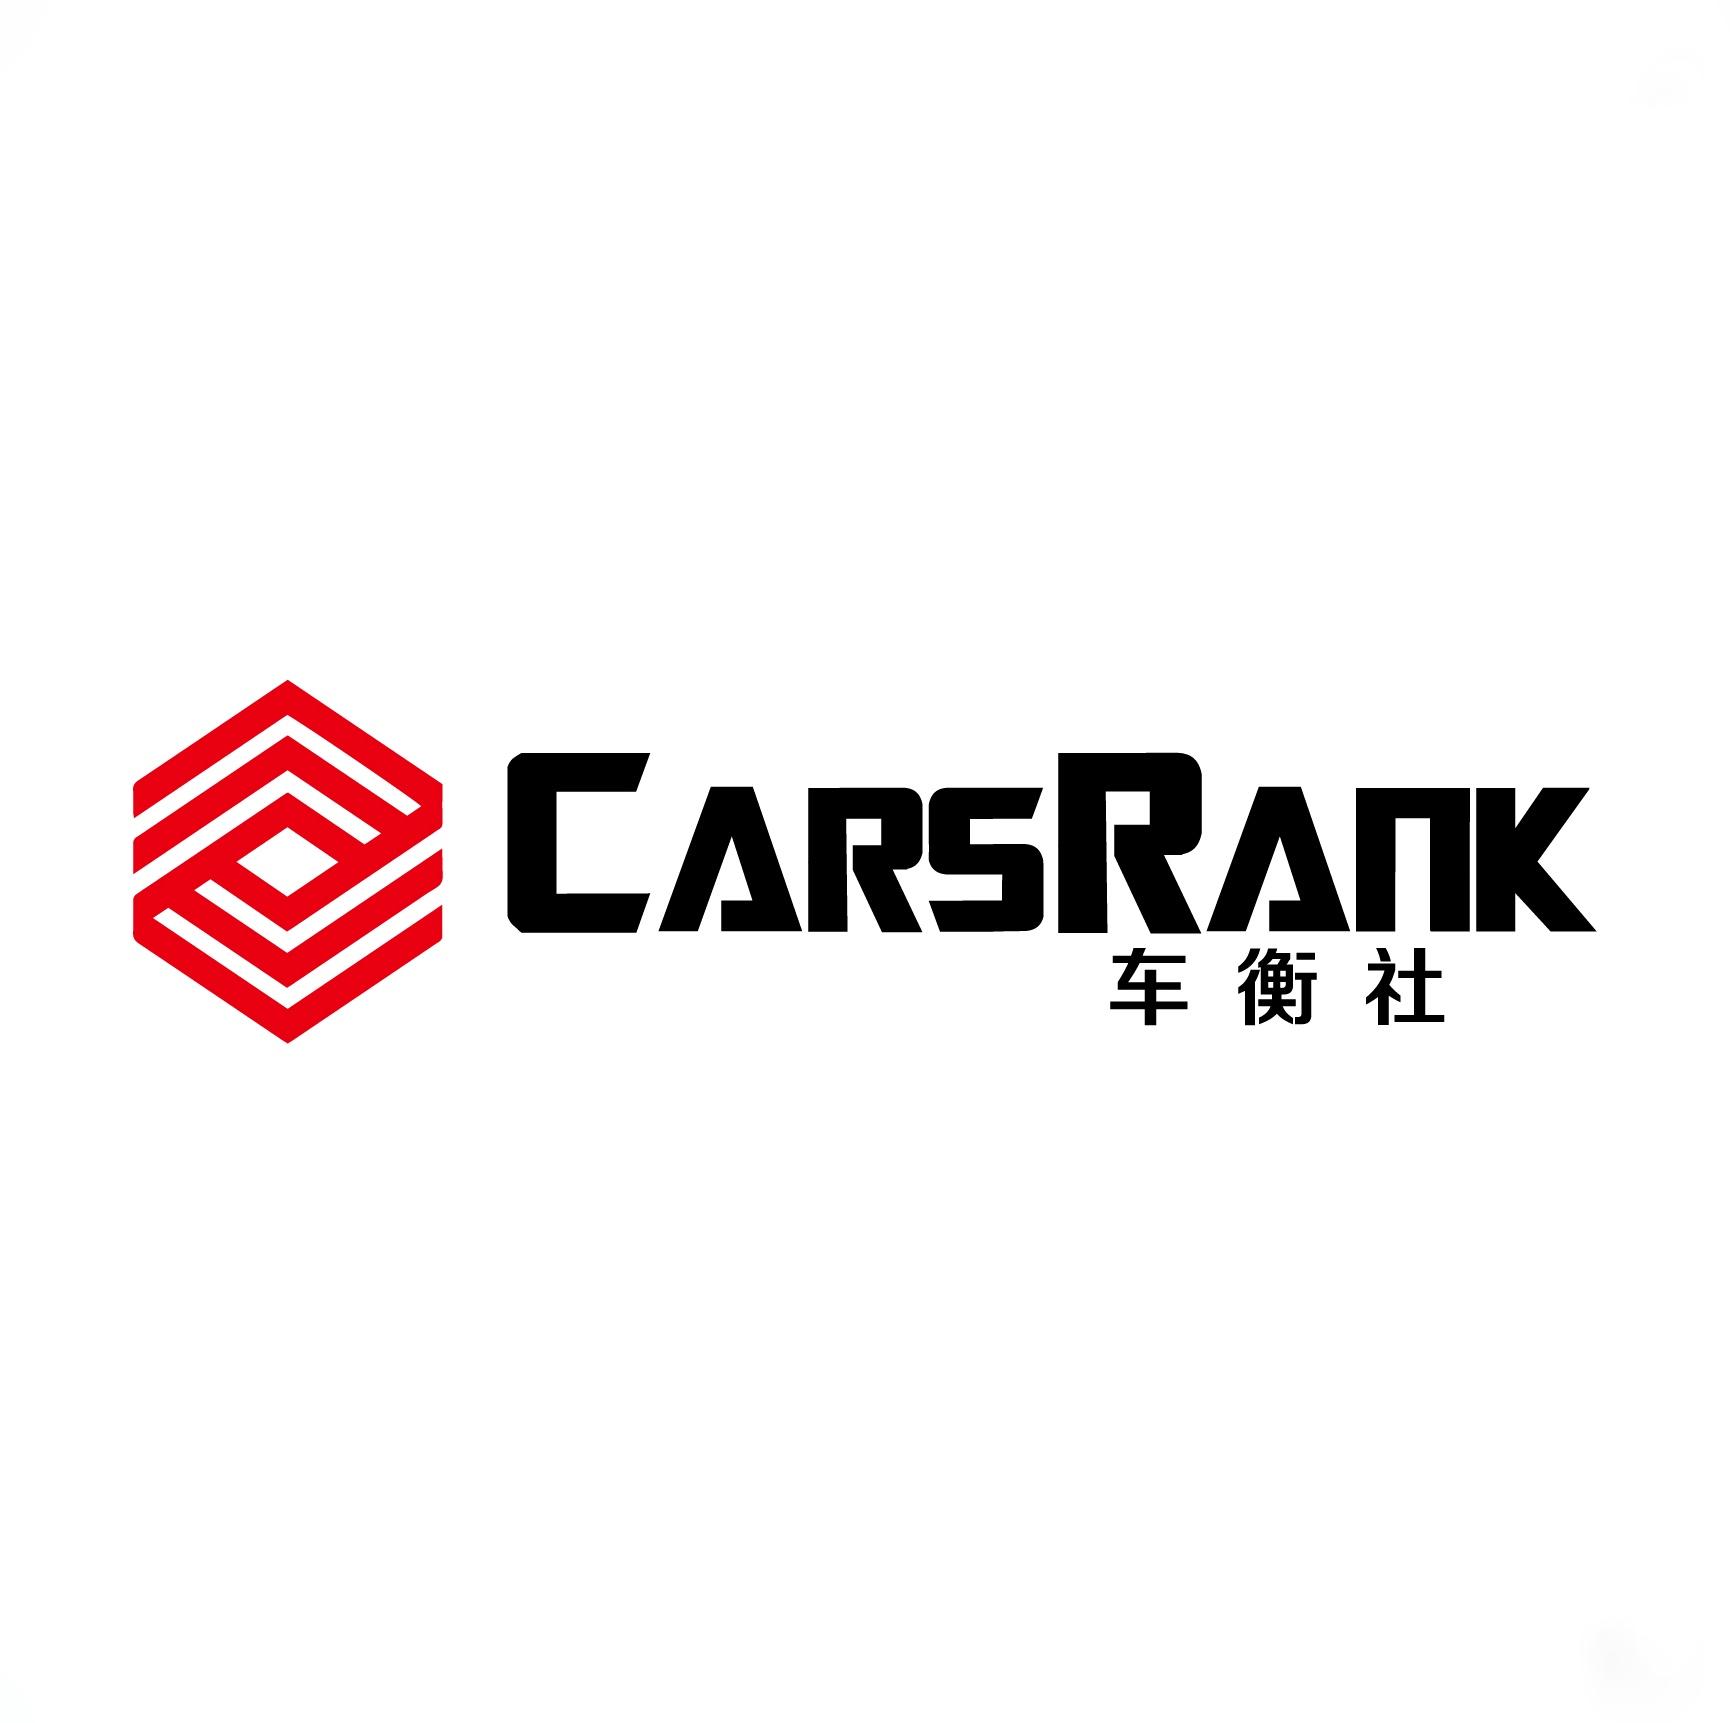 CarsRank